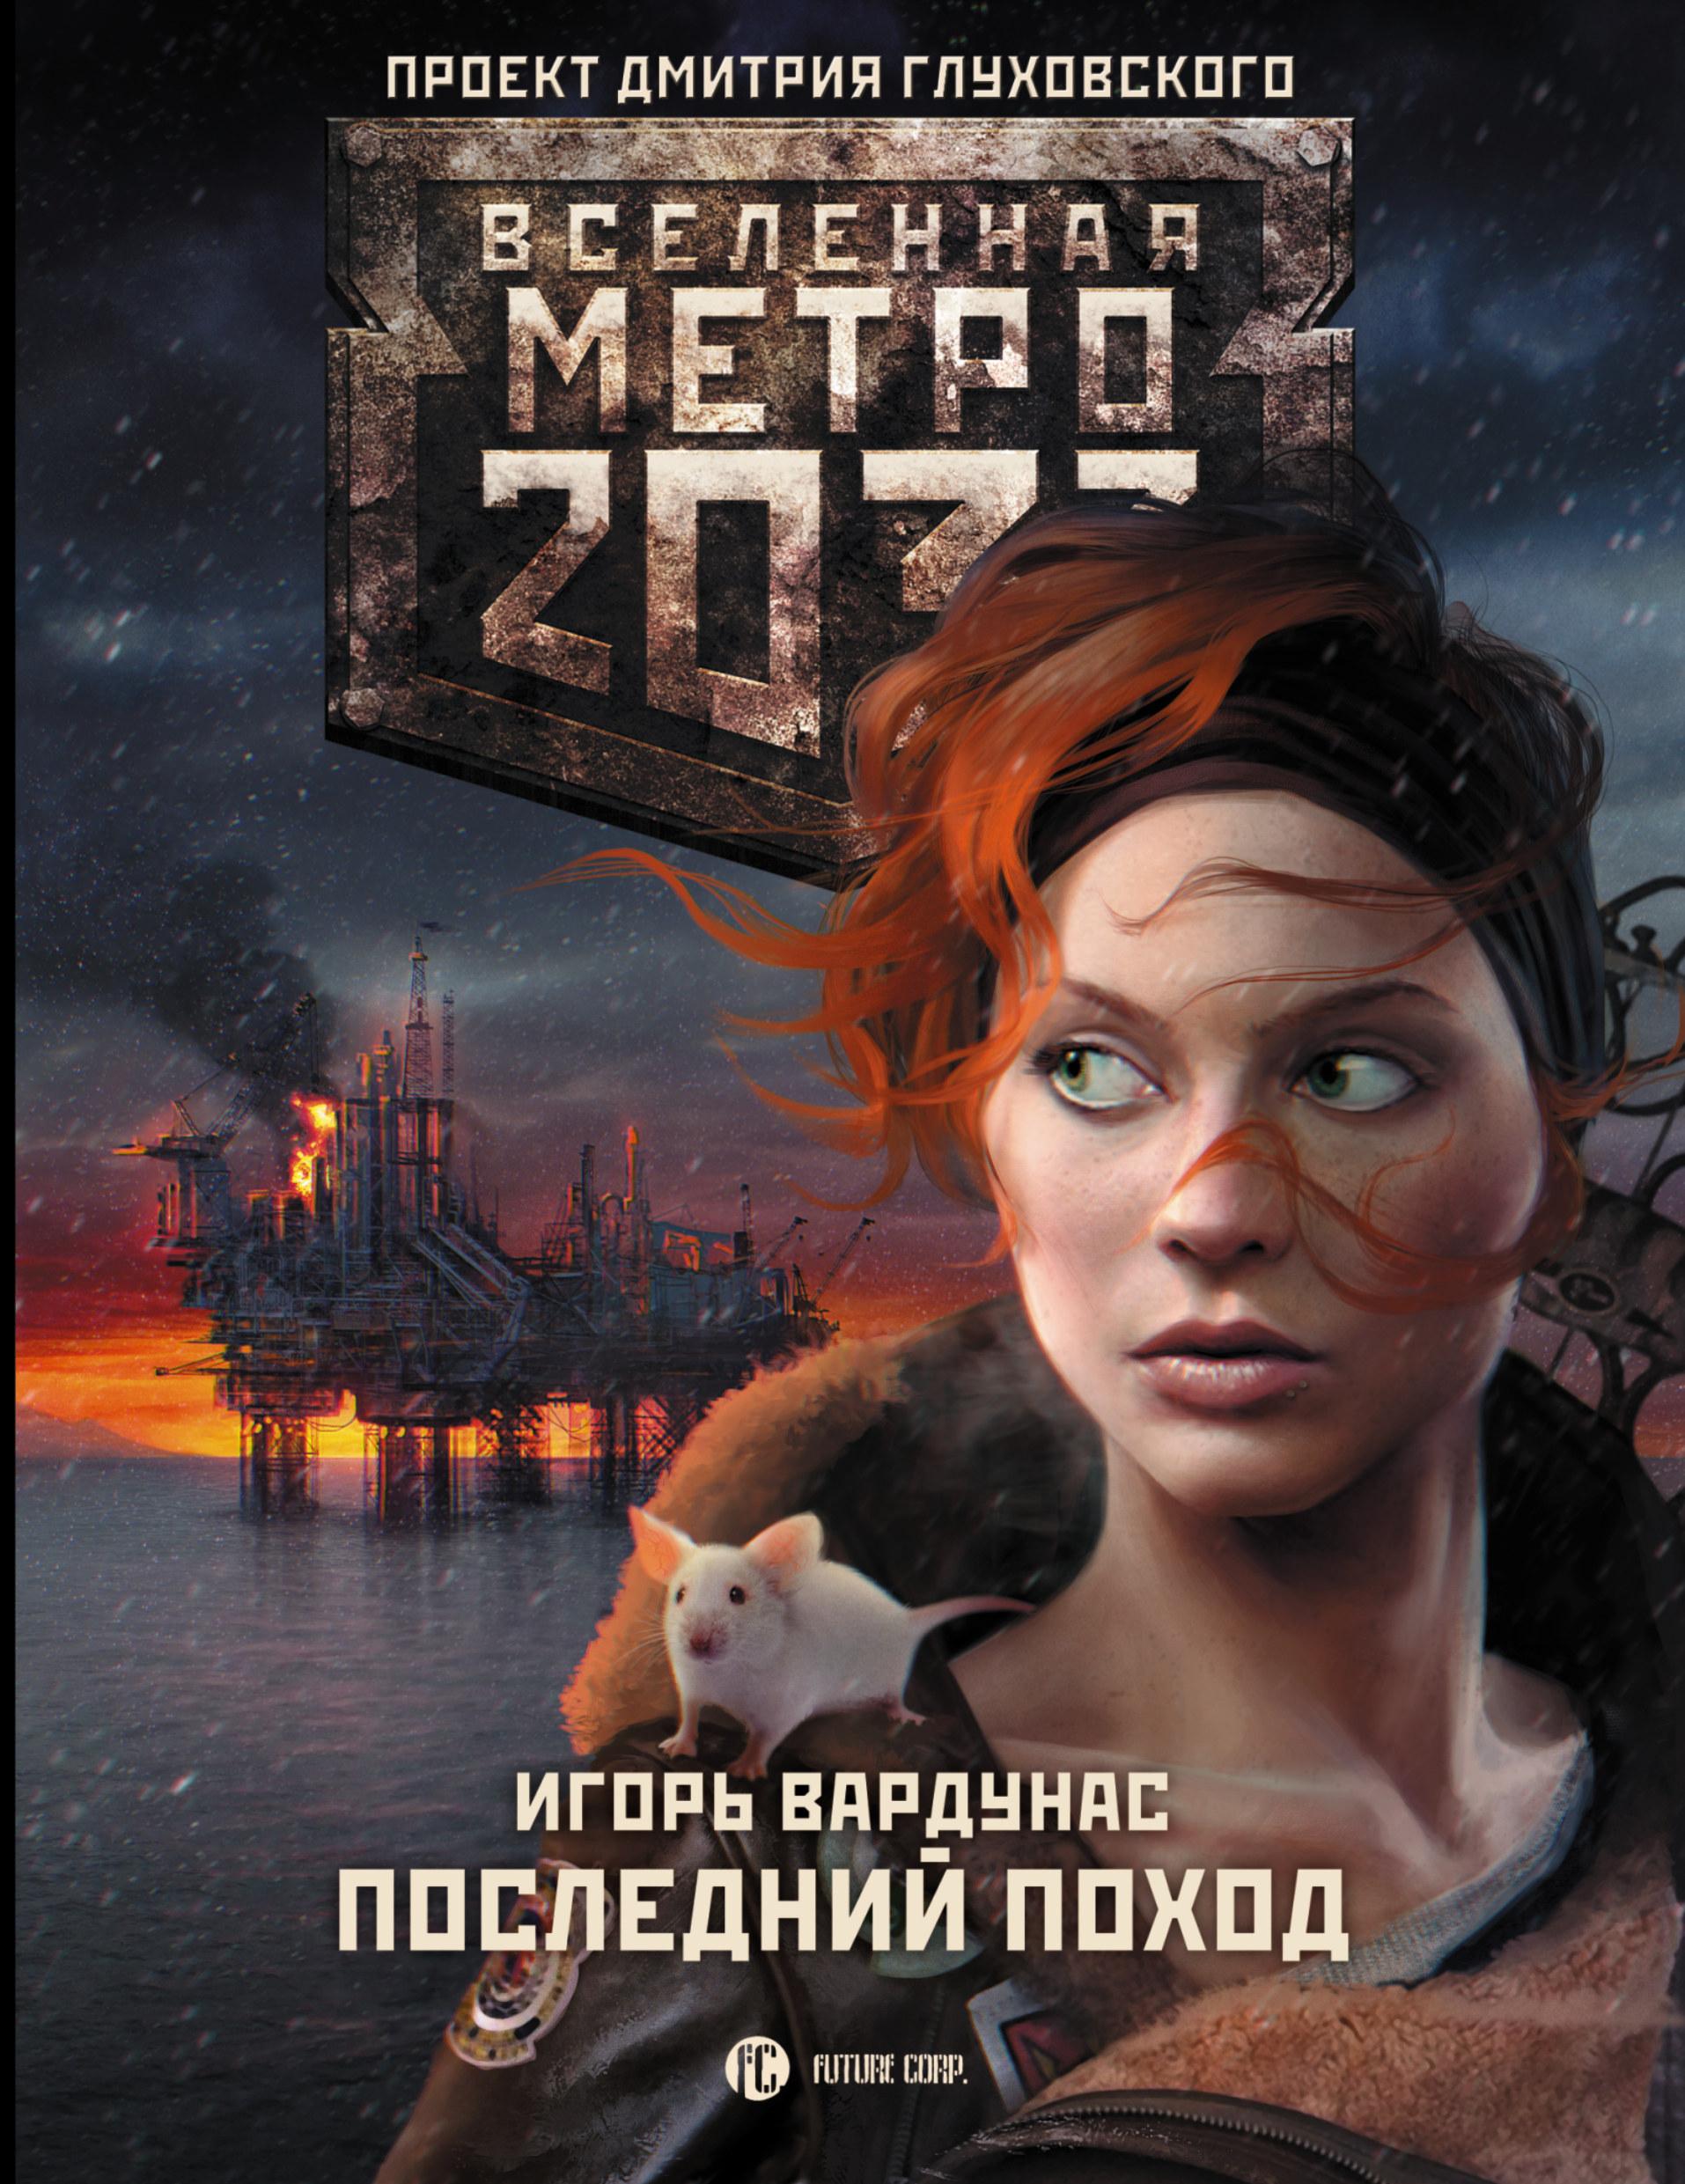 Игорь Вардунас Метро 2033: Последний поход